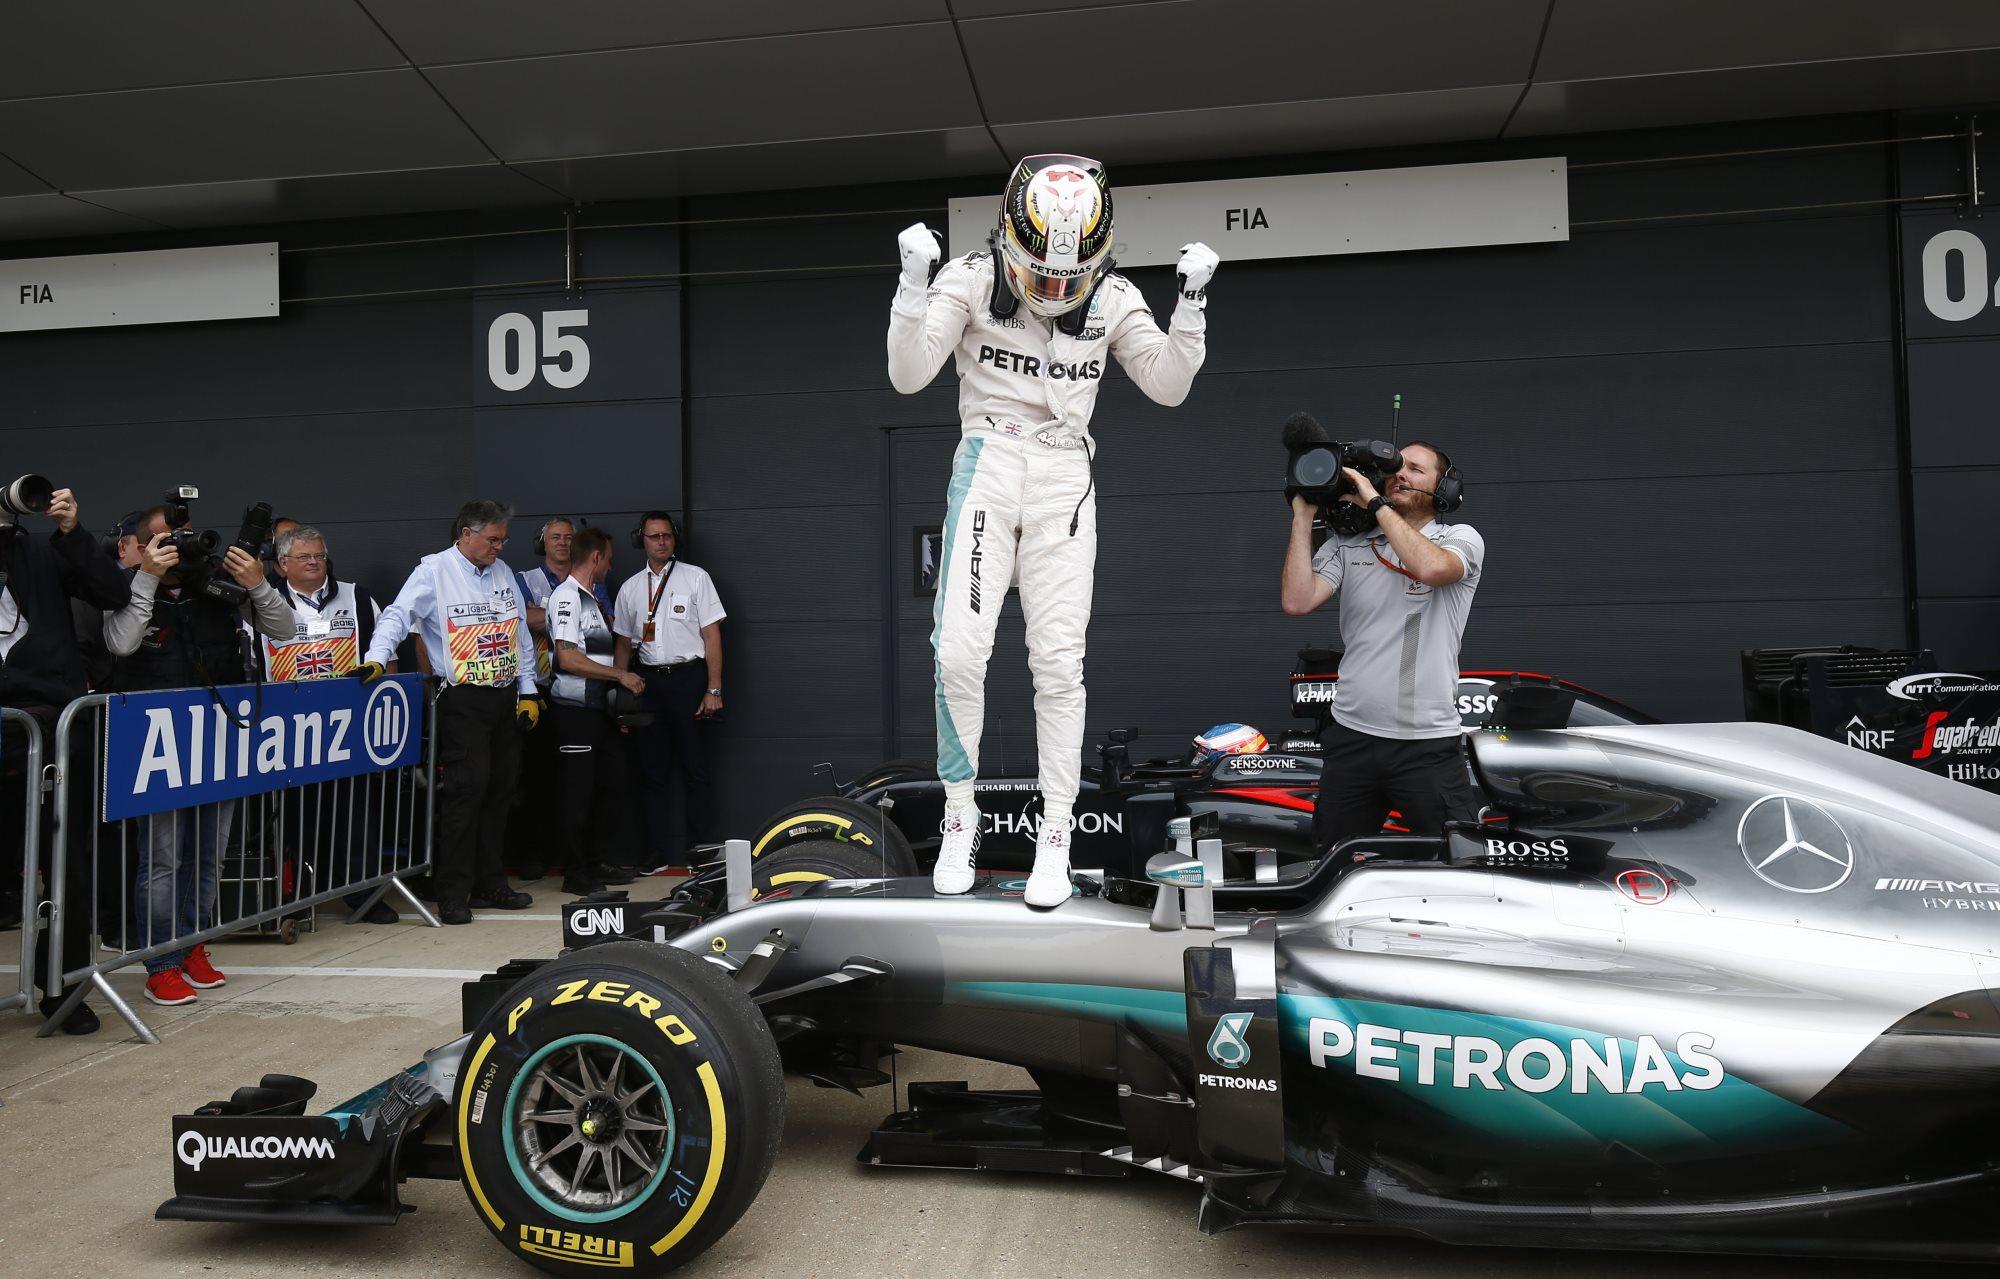 Lewis Hamilton Mercedes F1 W07 Hybrid Great Britain GP celebrates pole on car Silverstone F1 2016 Foto Daimler